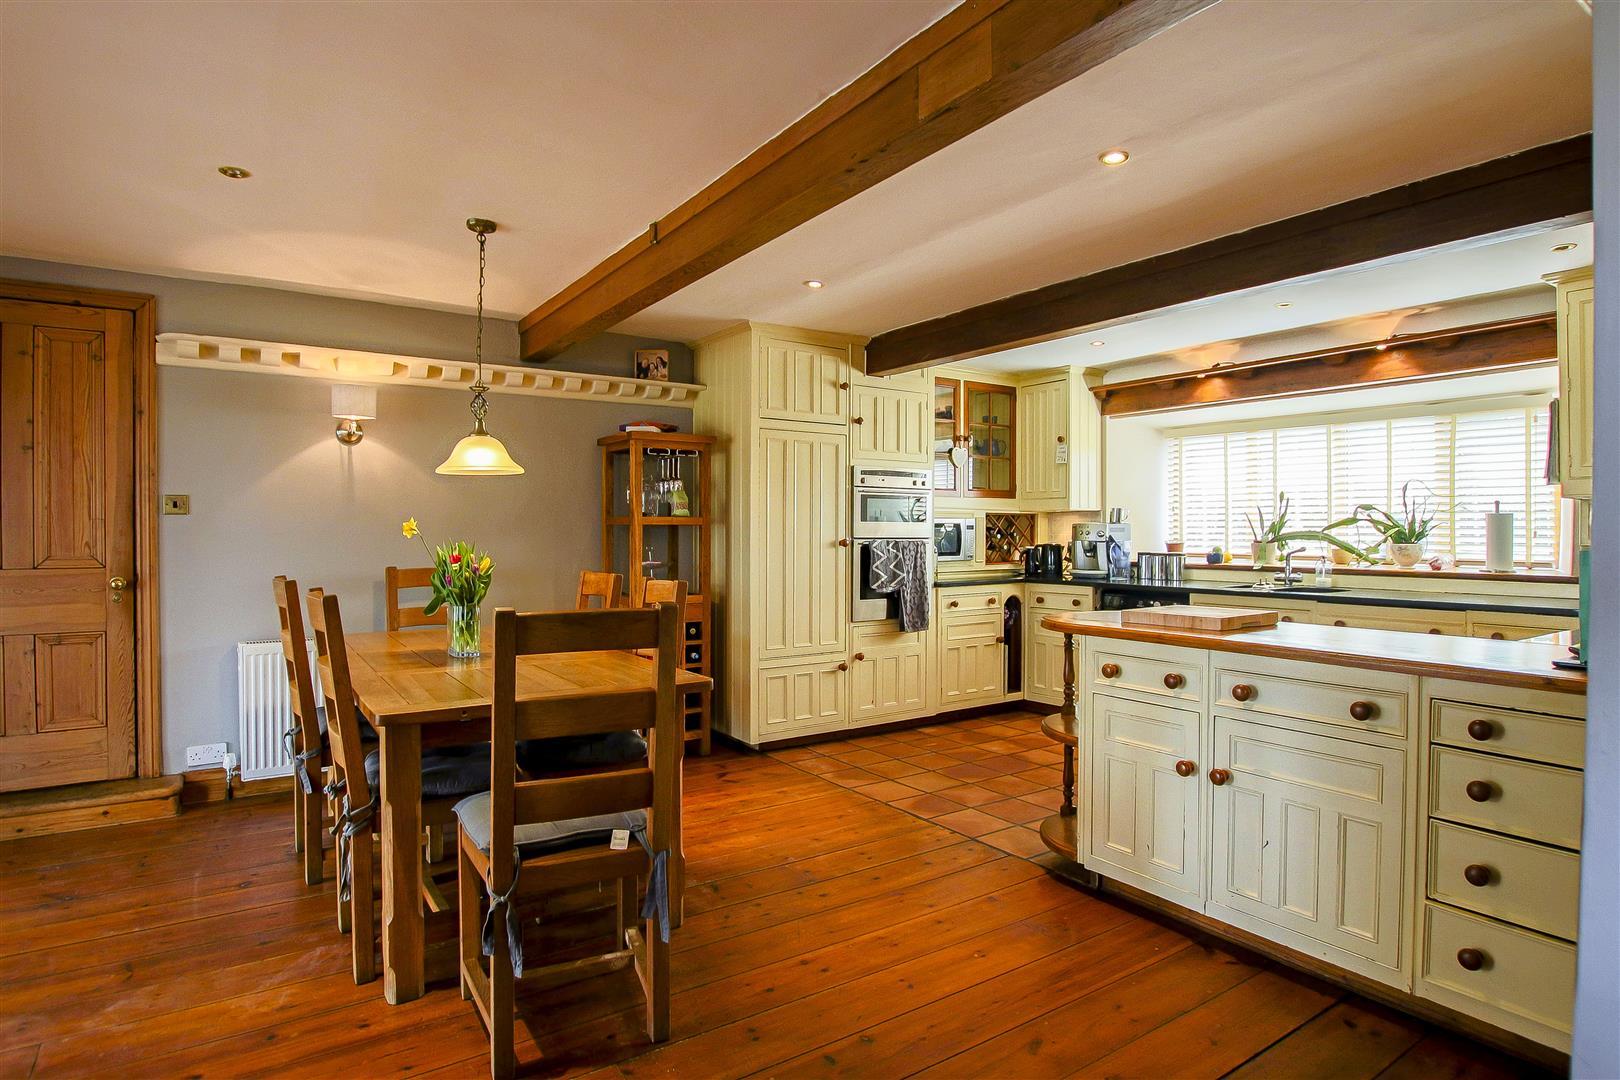 5 Bedroom Barn Conversion For Sale - 2.jpg